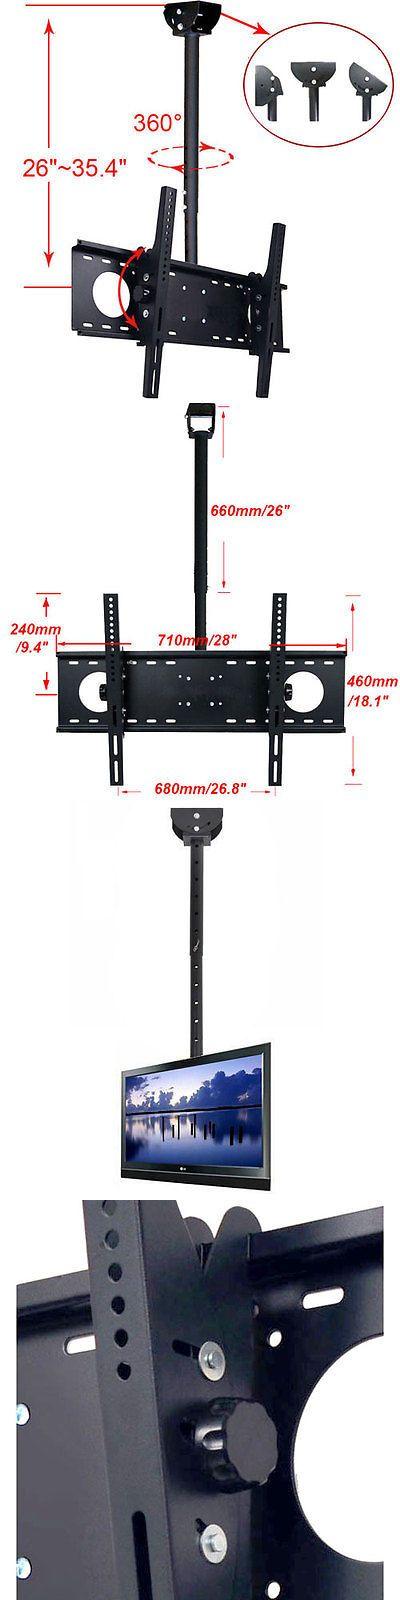 TV Mounts and Brackets: Ceiling Wall Mount Bracket Tilt Led Lcd Plasma Tv 32 39 40 42 46 47 50 55 60 65 -> BUY IT NOW ONLY: $48.99 on eBay!